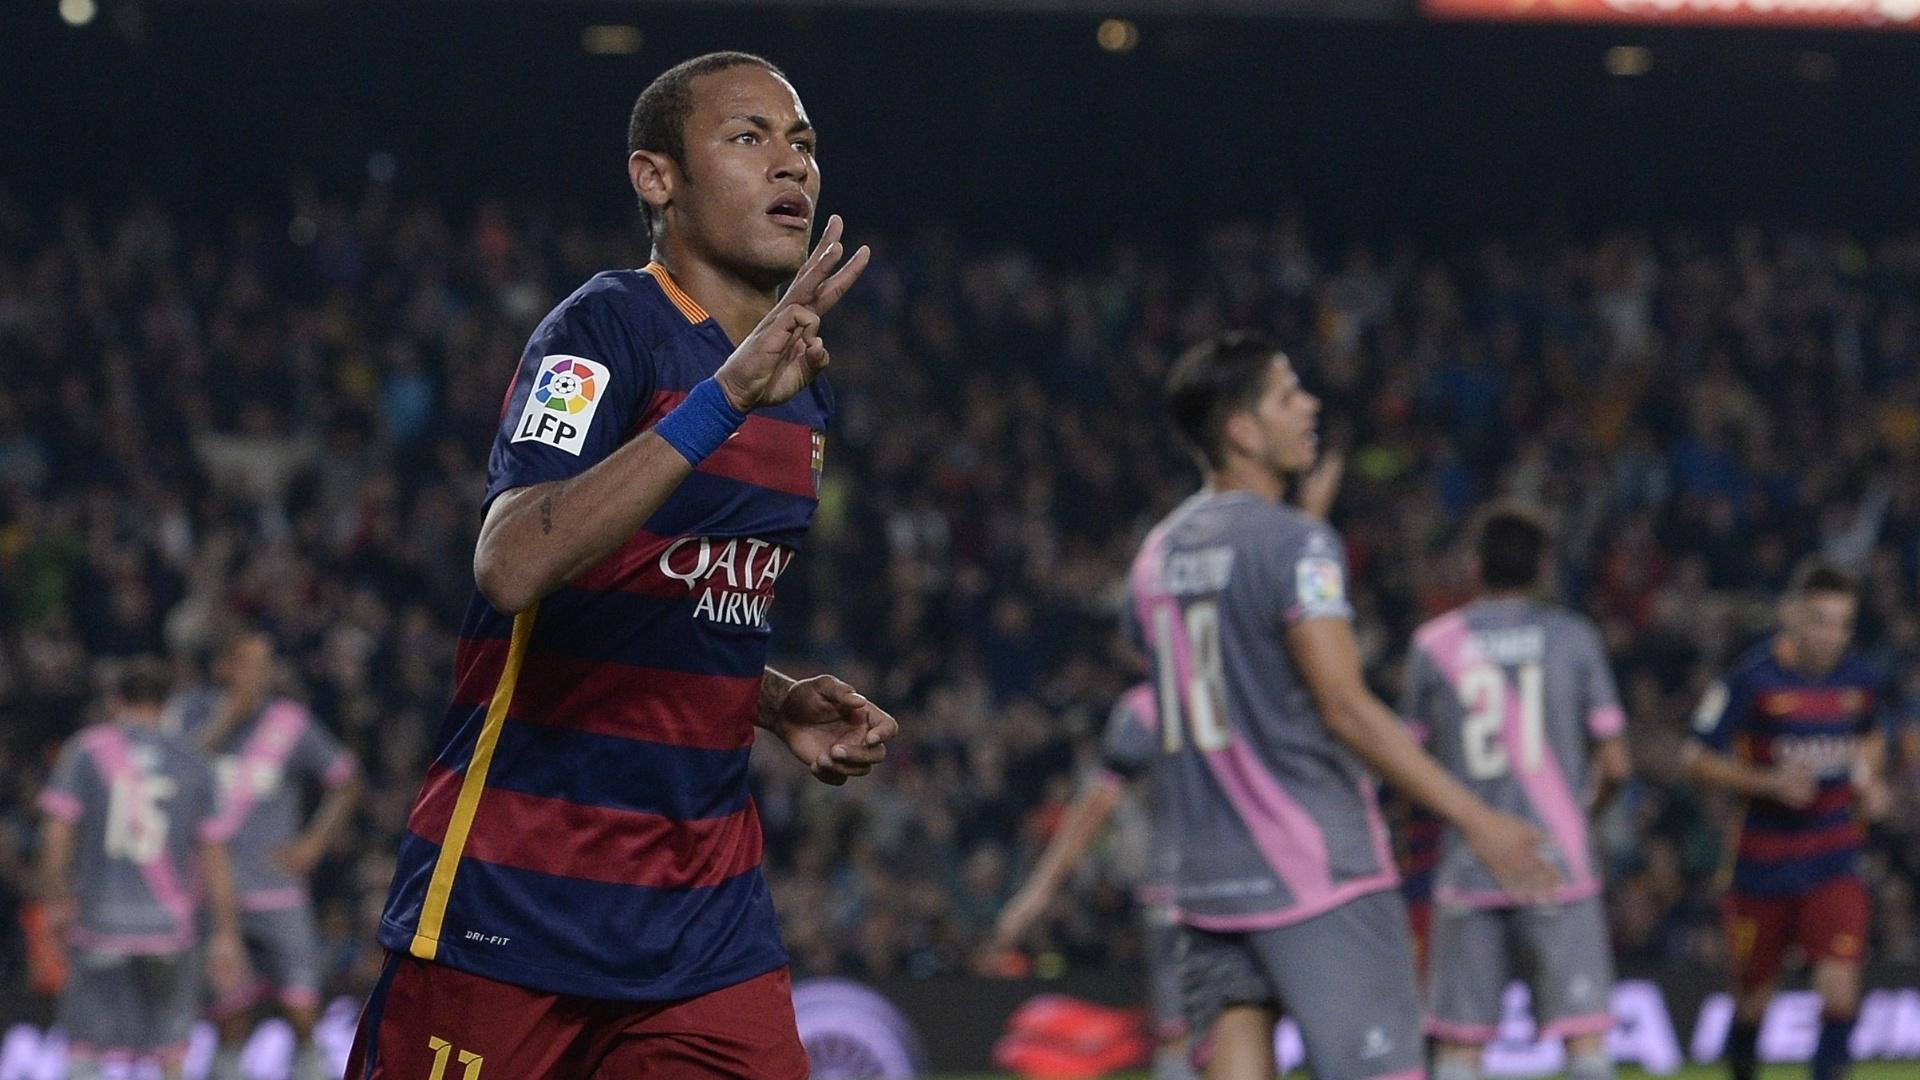 Neymar comemora após marcar contra o Rayo Vallecano pelo Campeonato Espanhol